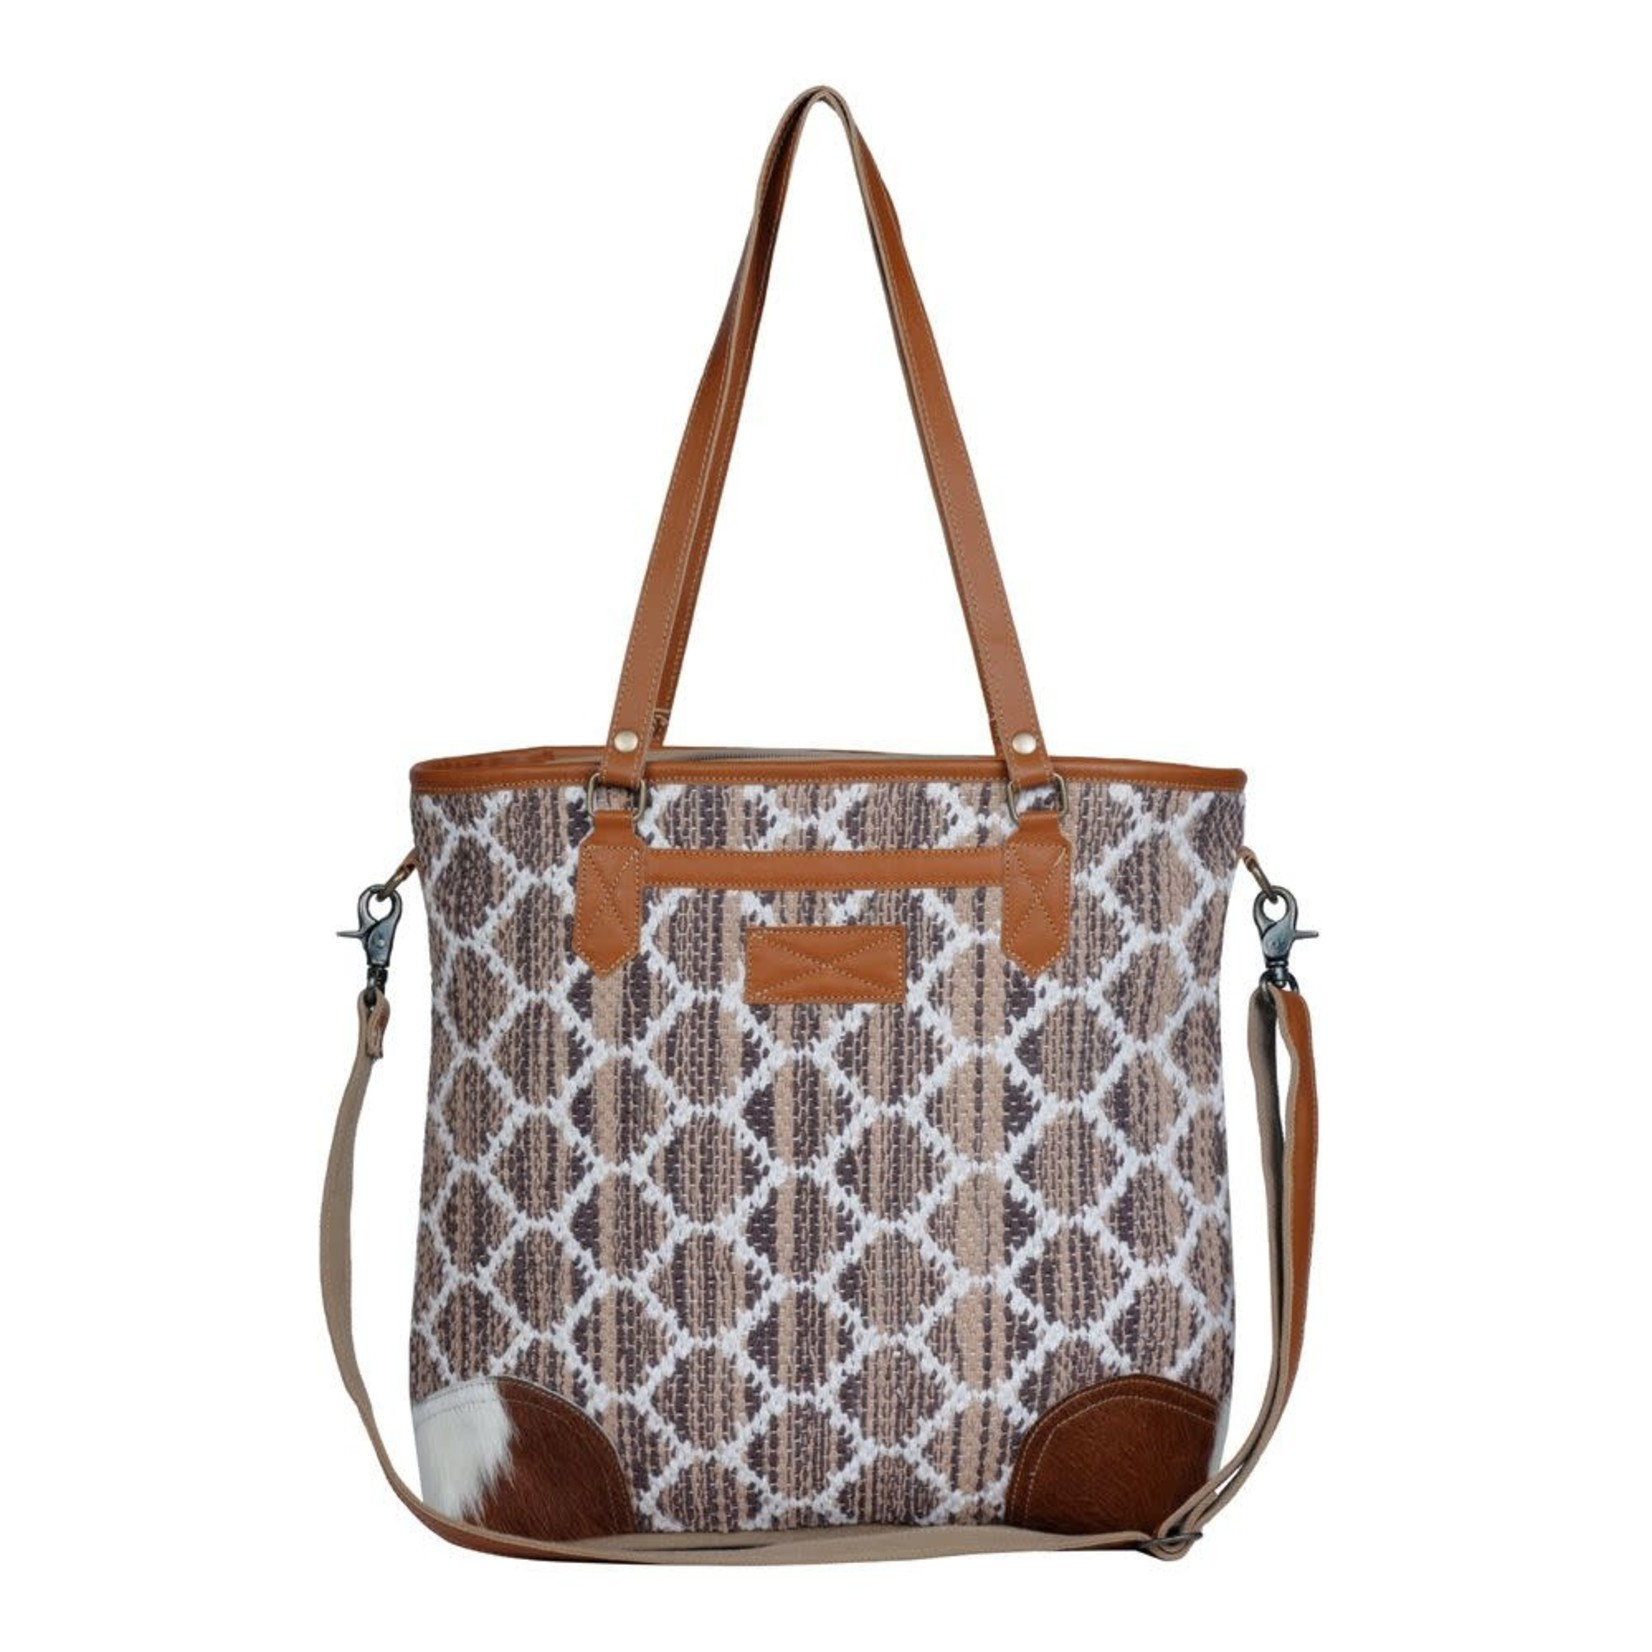 Myra Bags Myra Bag Perfect Match Tote